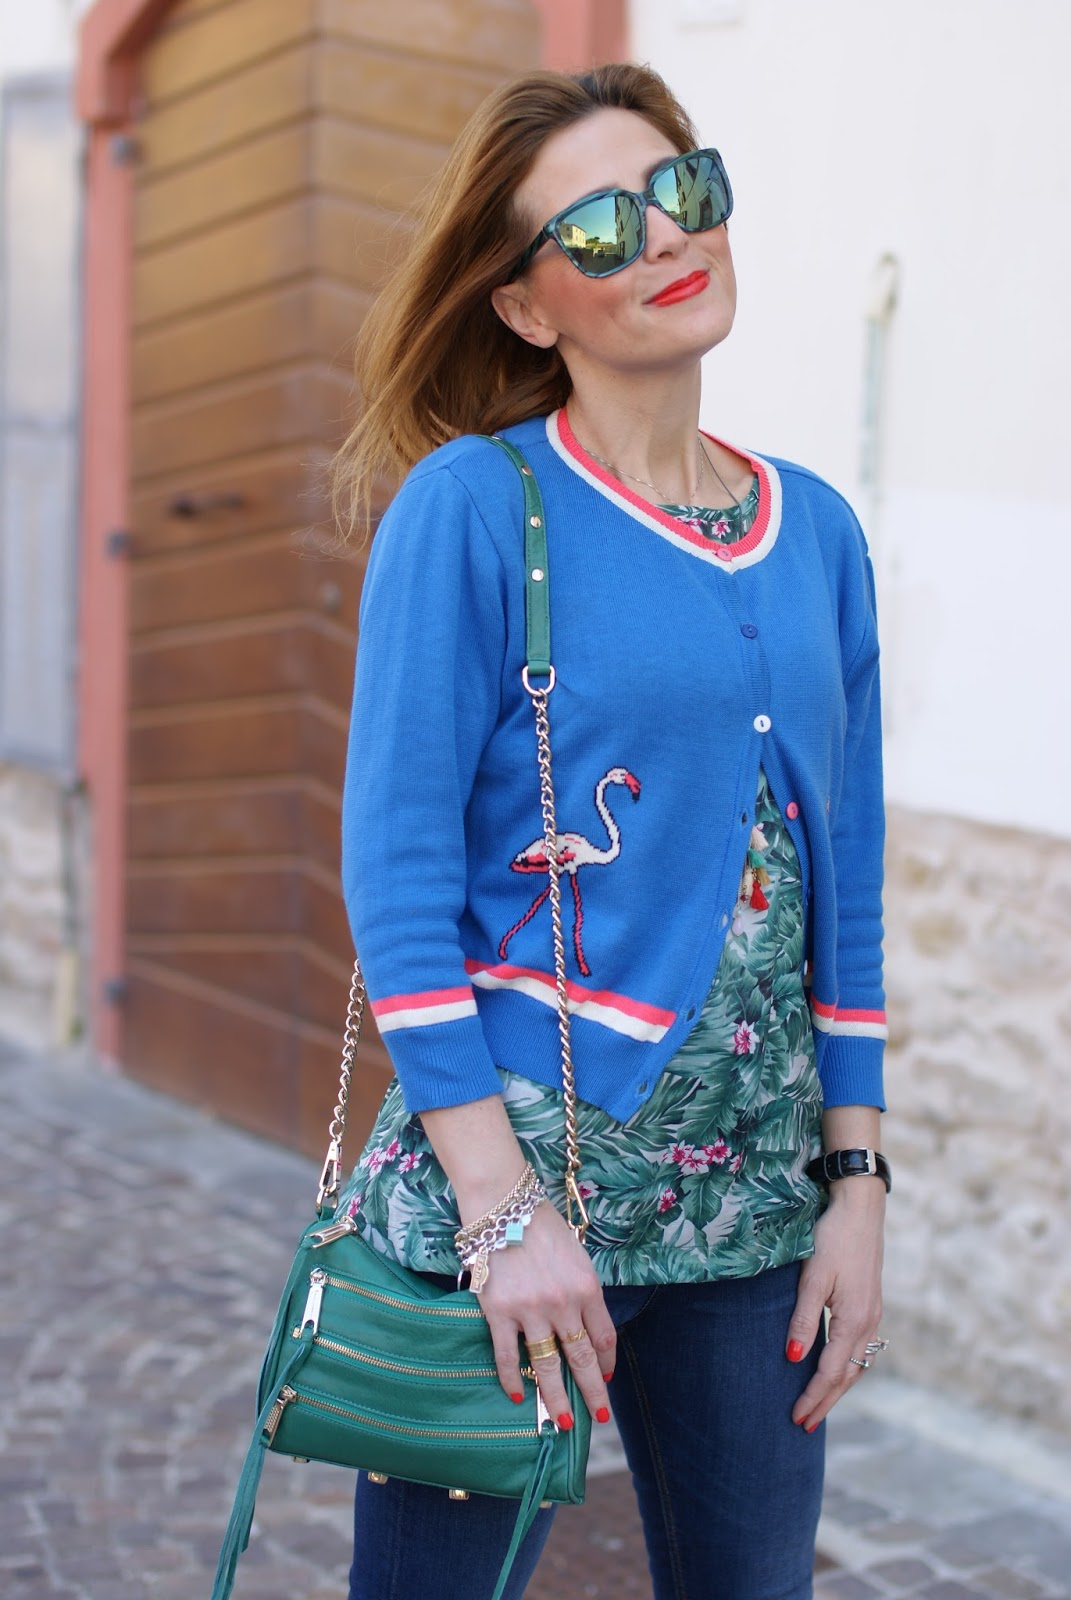 Bryonyandco flamingo cardigan on Fashion and Cookies fashion blog, fashion blogger style